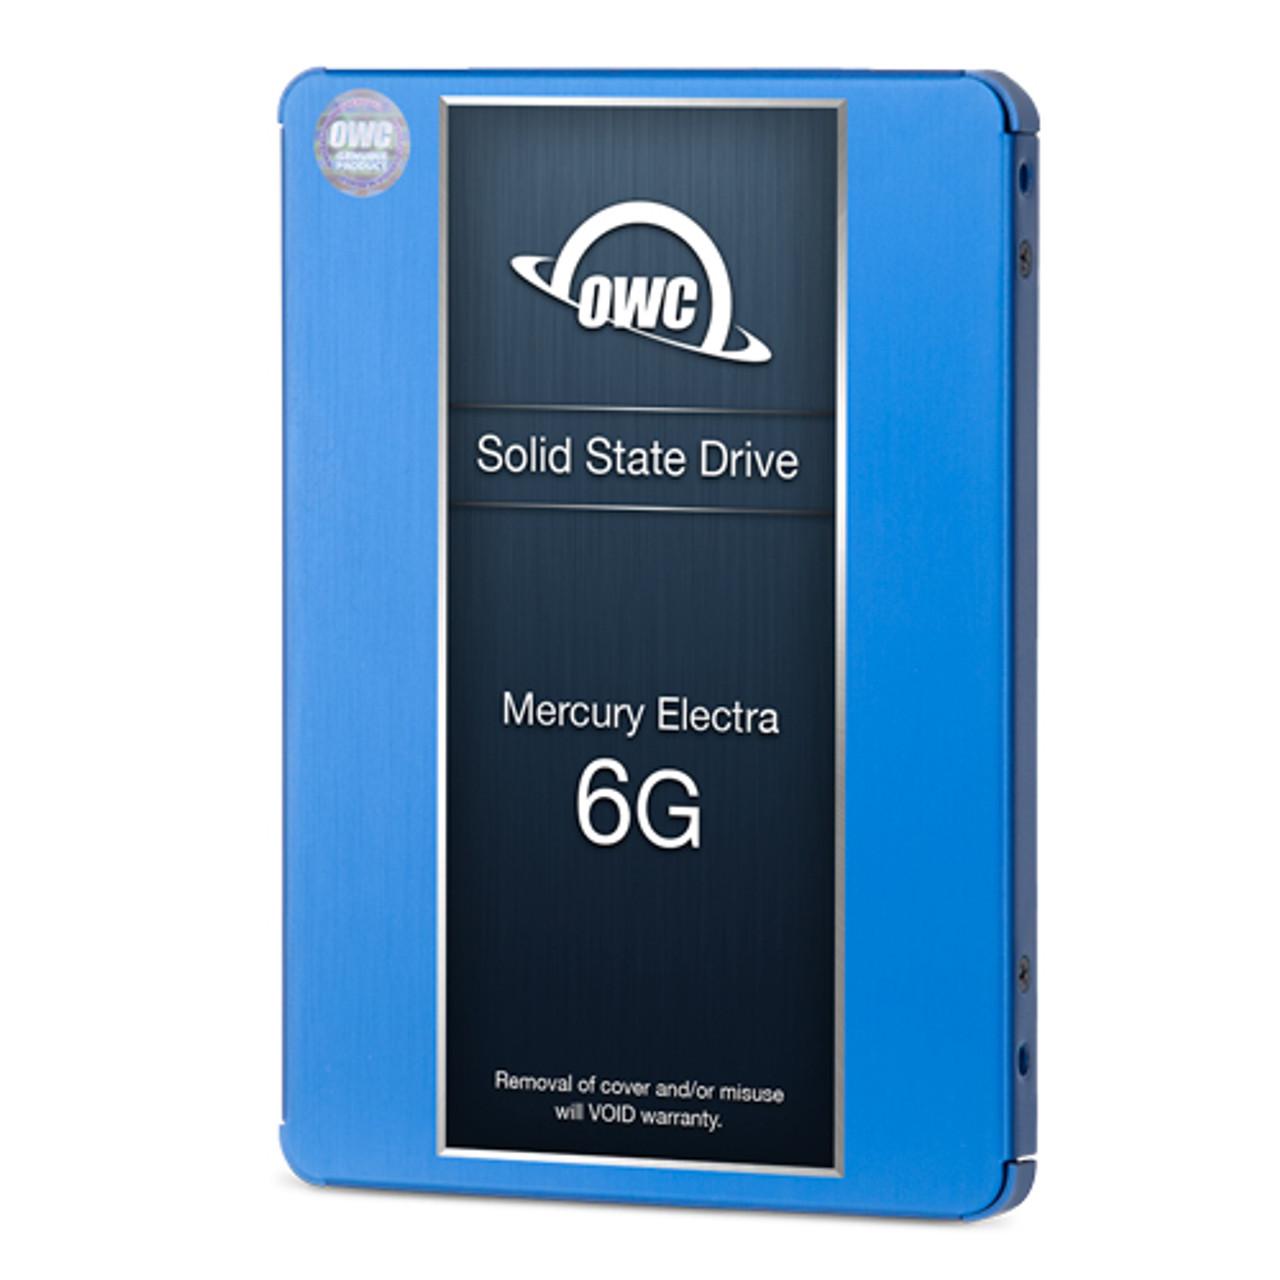 1TB OWC Mercury Electra 6G SSD - SSD Bay Add-In Kit for 2011 21.5-inch iMacs